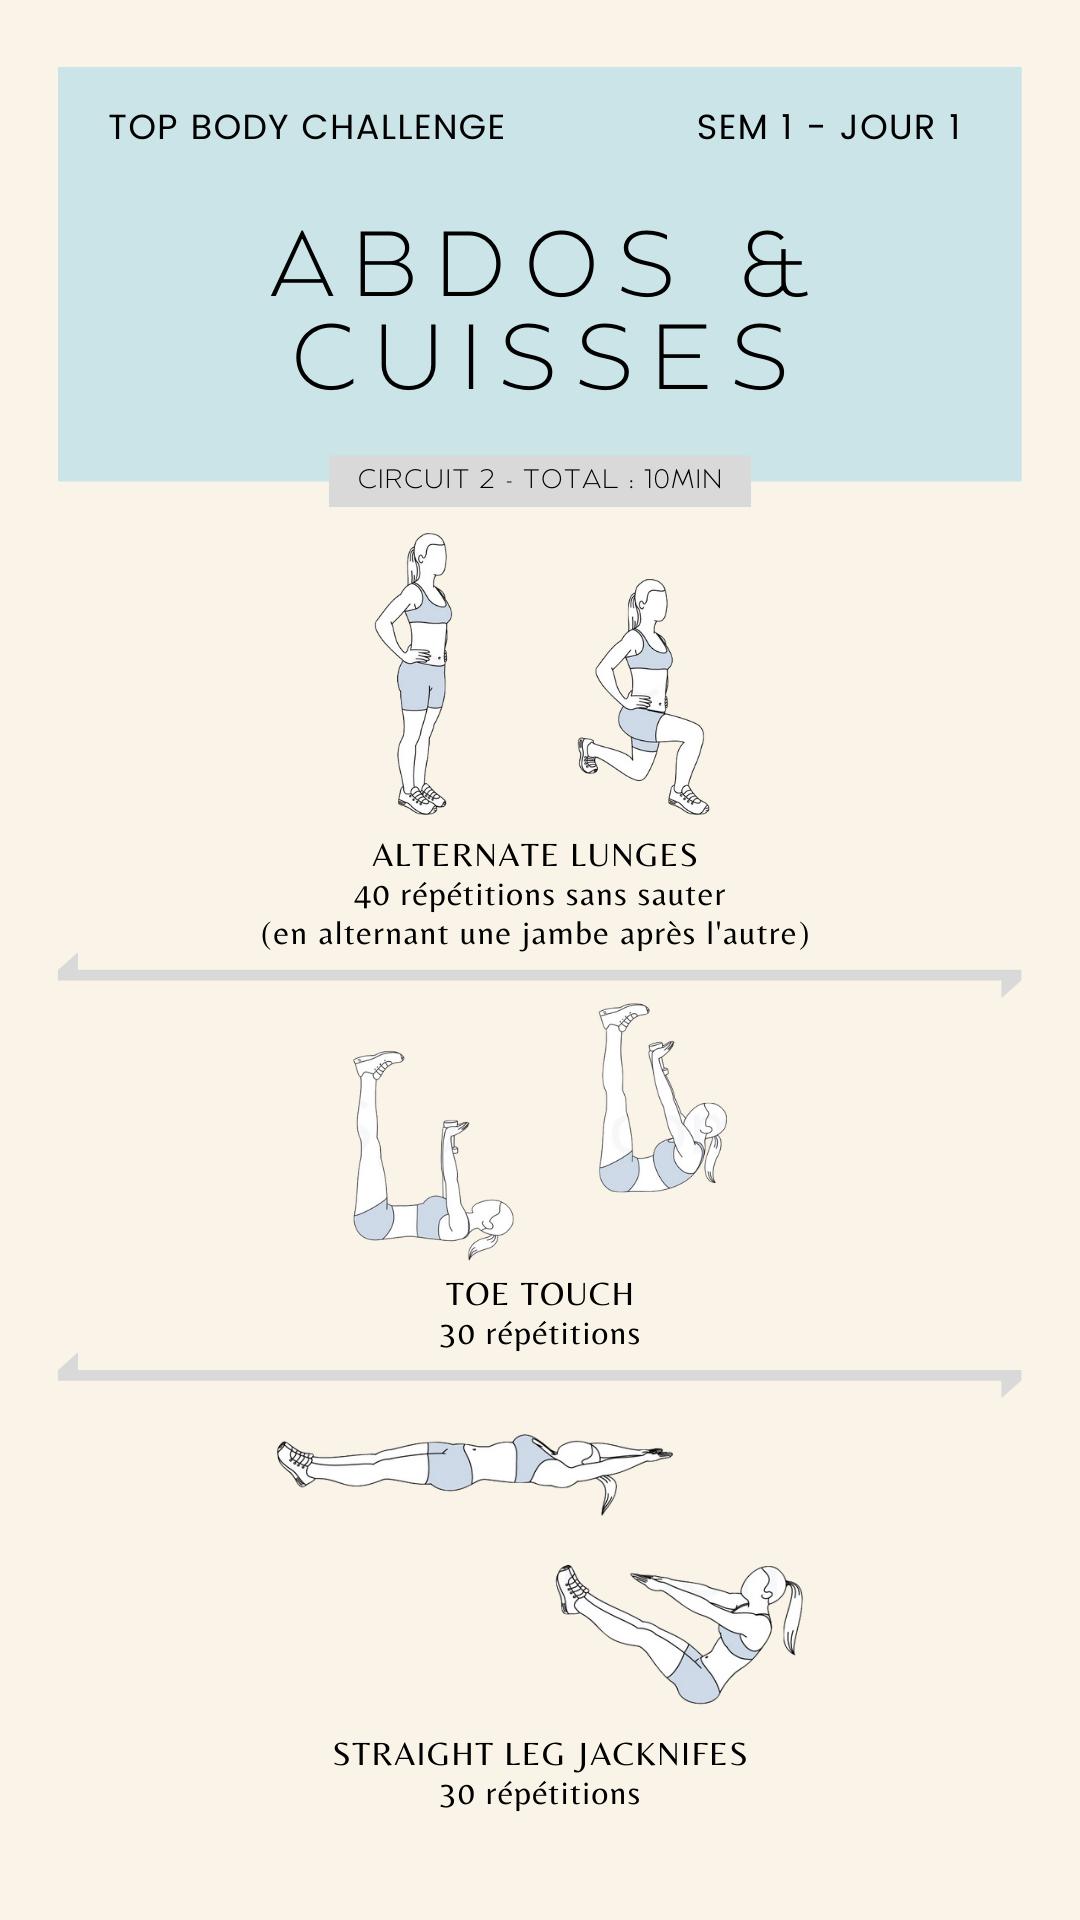 exercice tes semaine 1